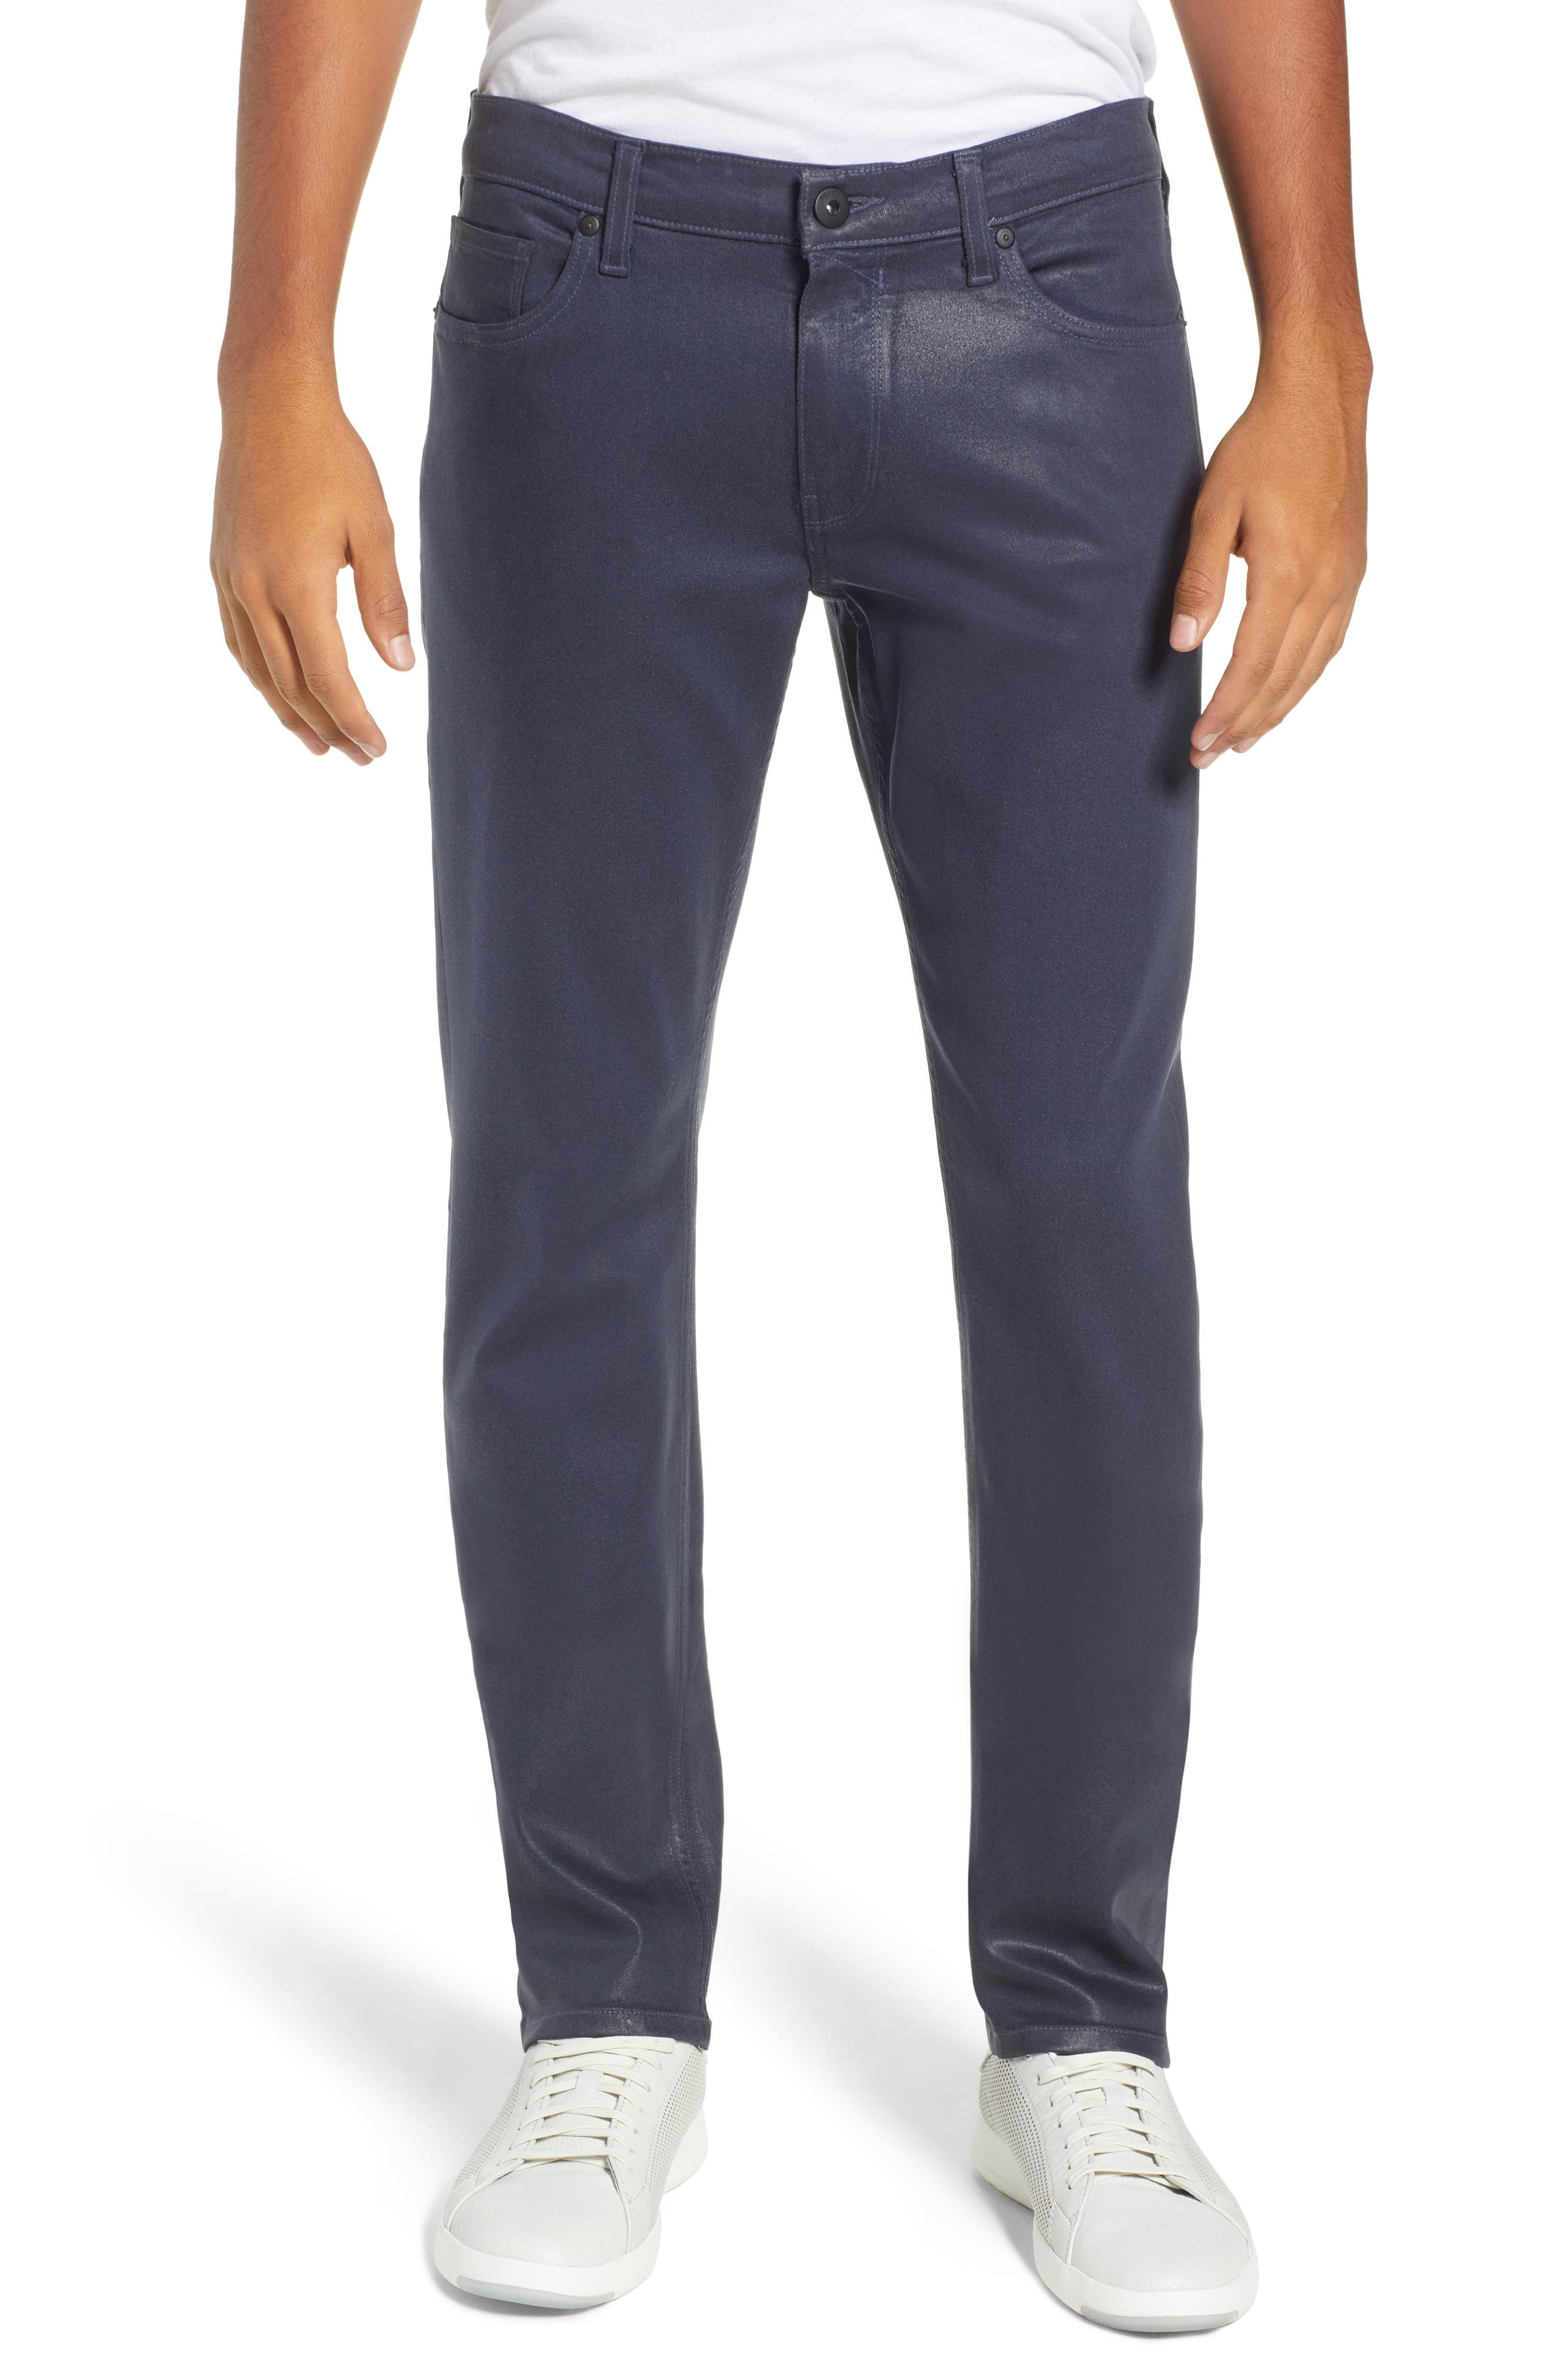 Transcend - Lennox Slim Fit Jeans,                             Main thumbnail 1, color,                             NIGHTFALL COATED